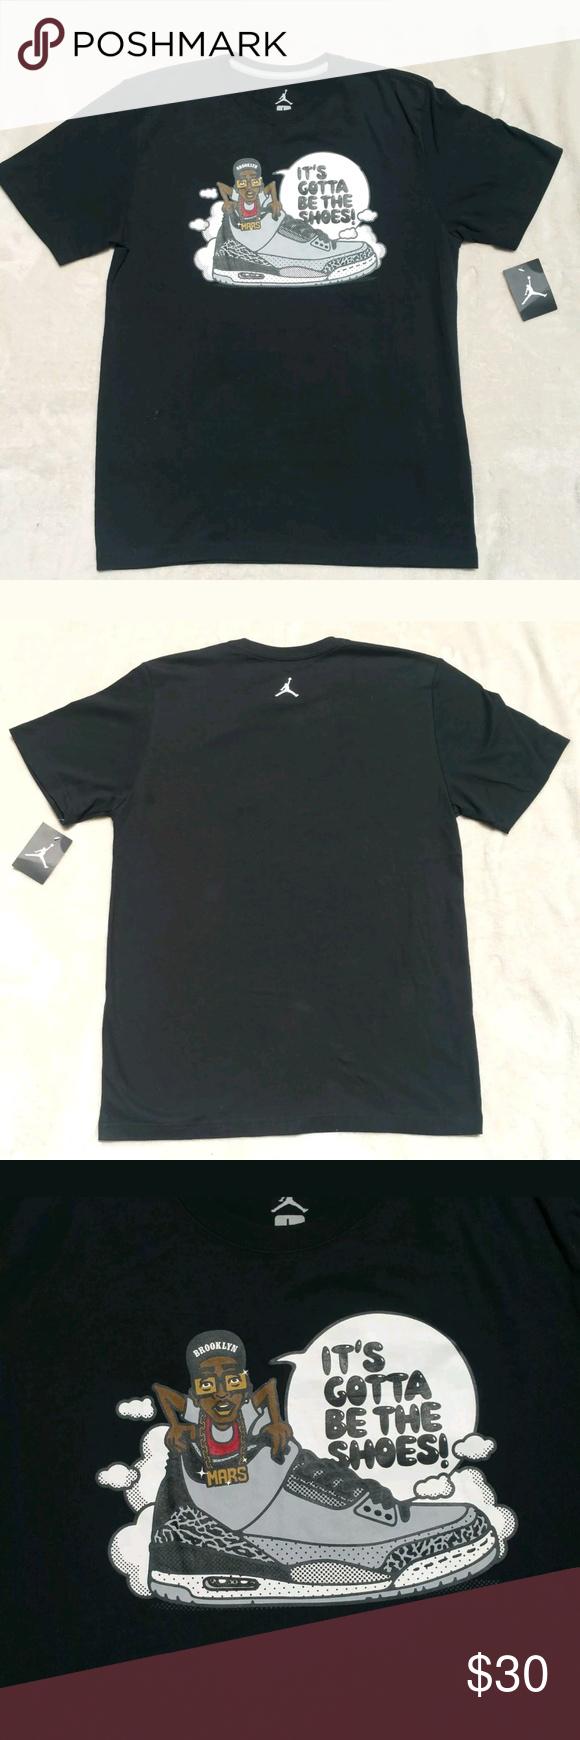 d41a0553b390 Nike Air Jordan Spike Lee